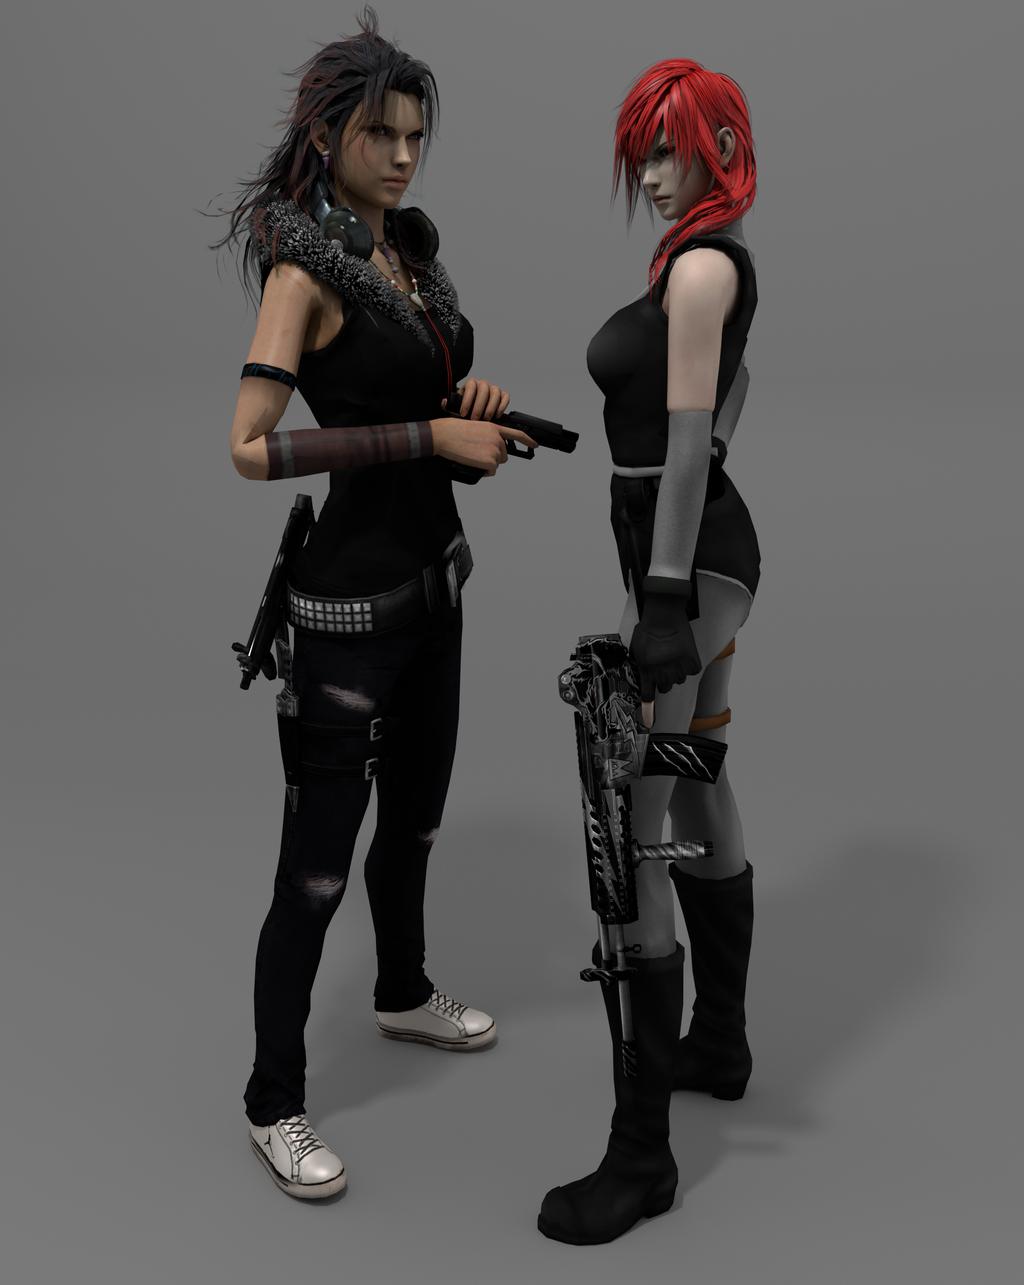 The Mercenaries (Cycles Test) by DJoeliantofarron